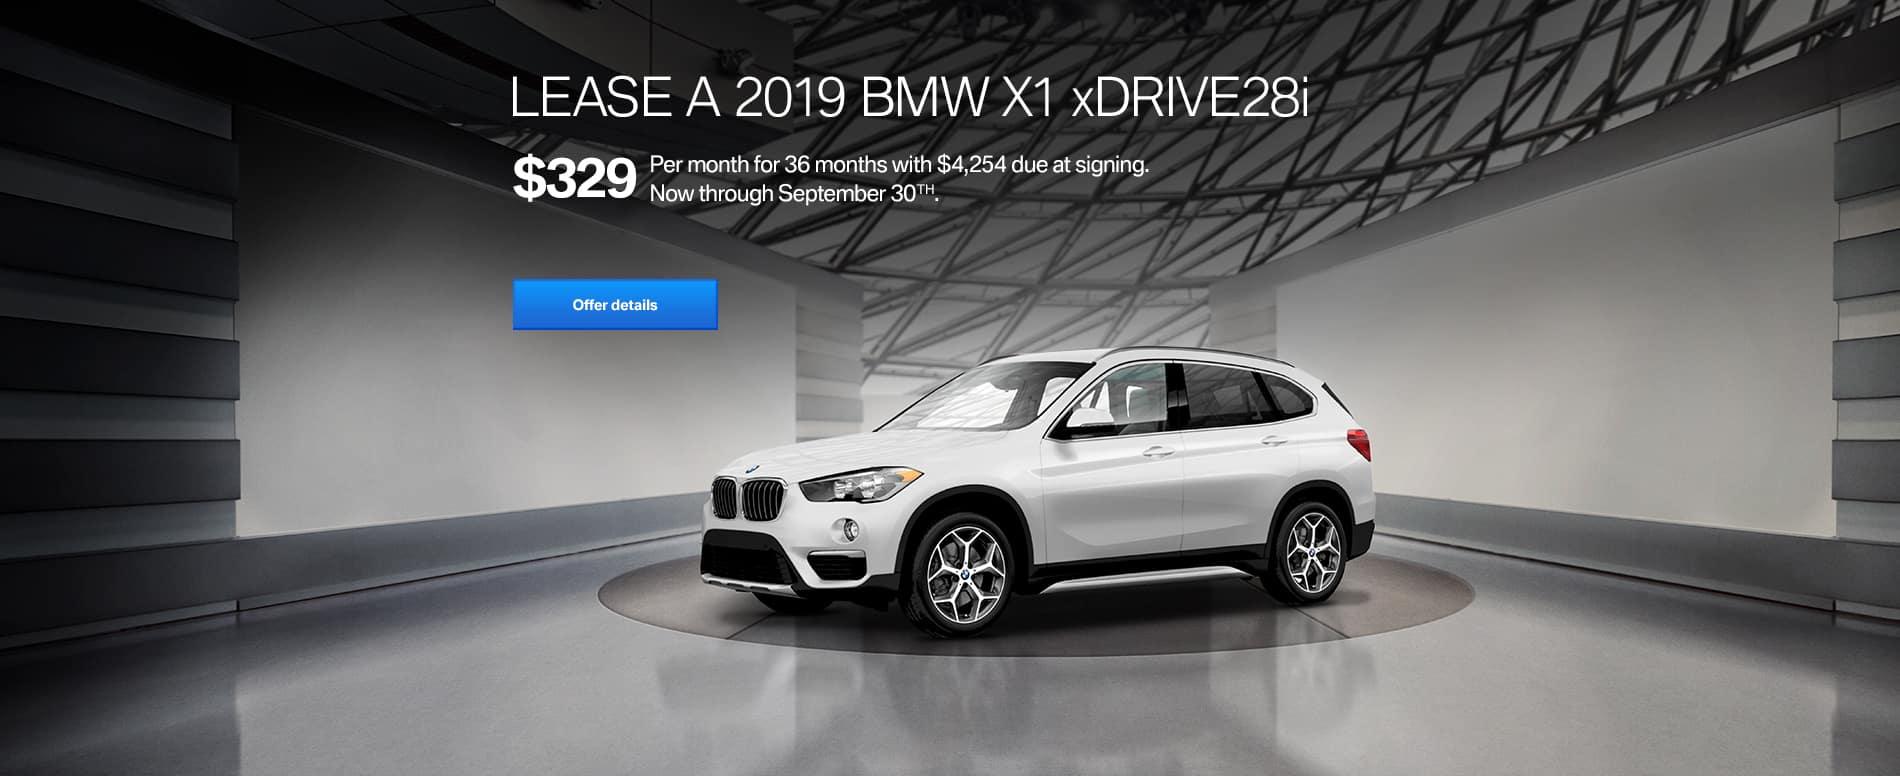 BMW of Brooklyn | New & Used BMW Dealership | BMW Service Center